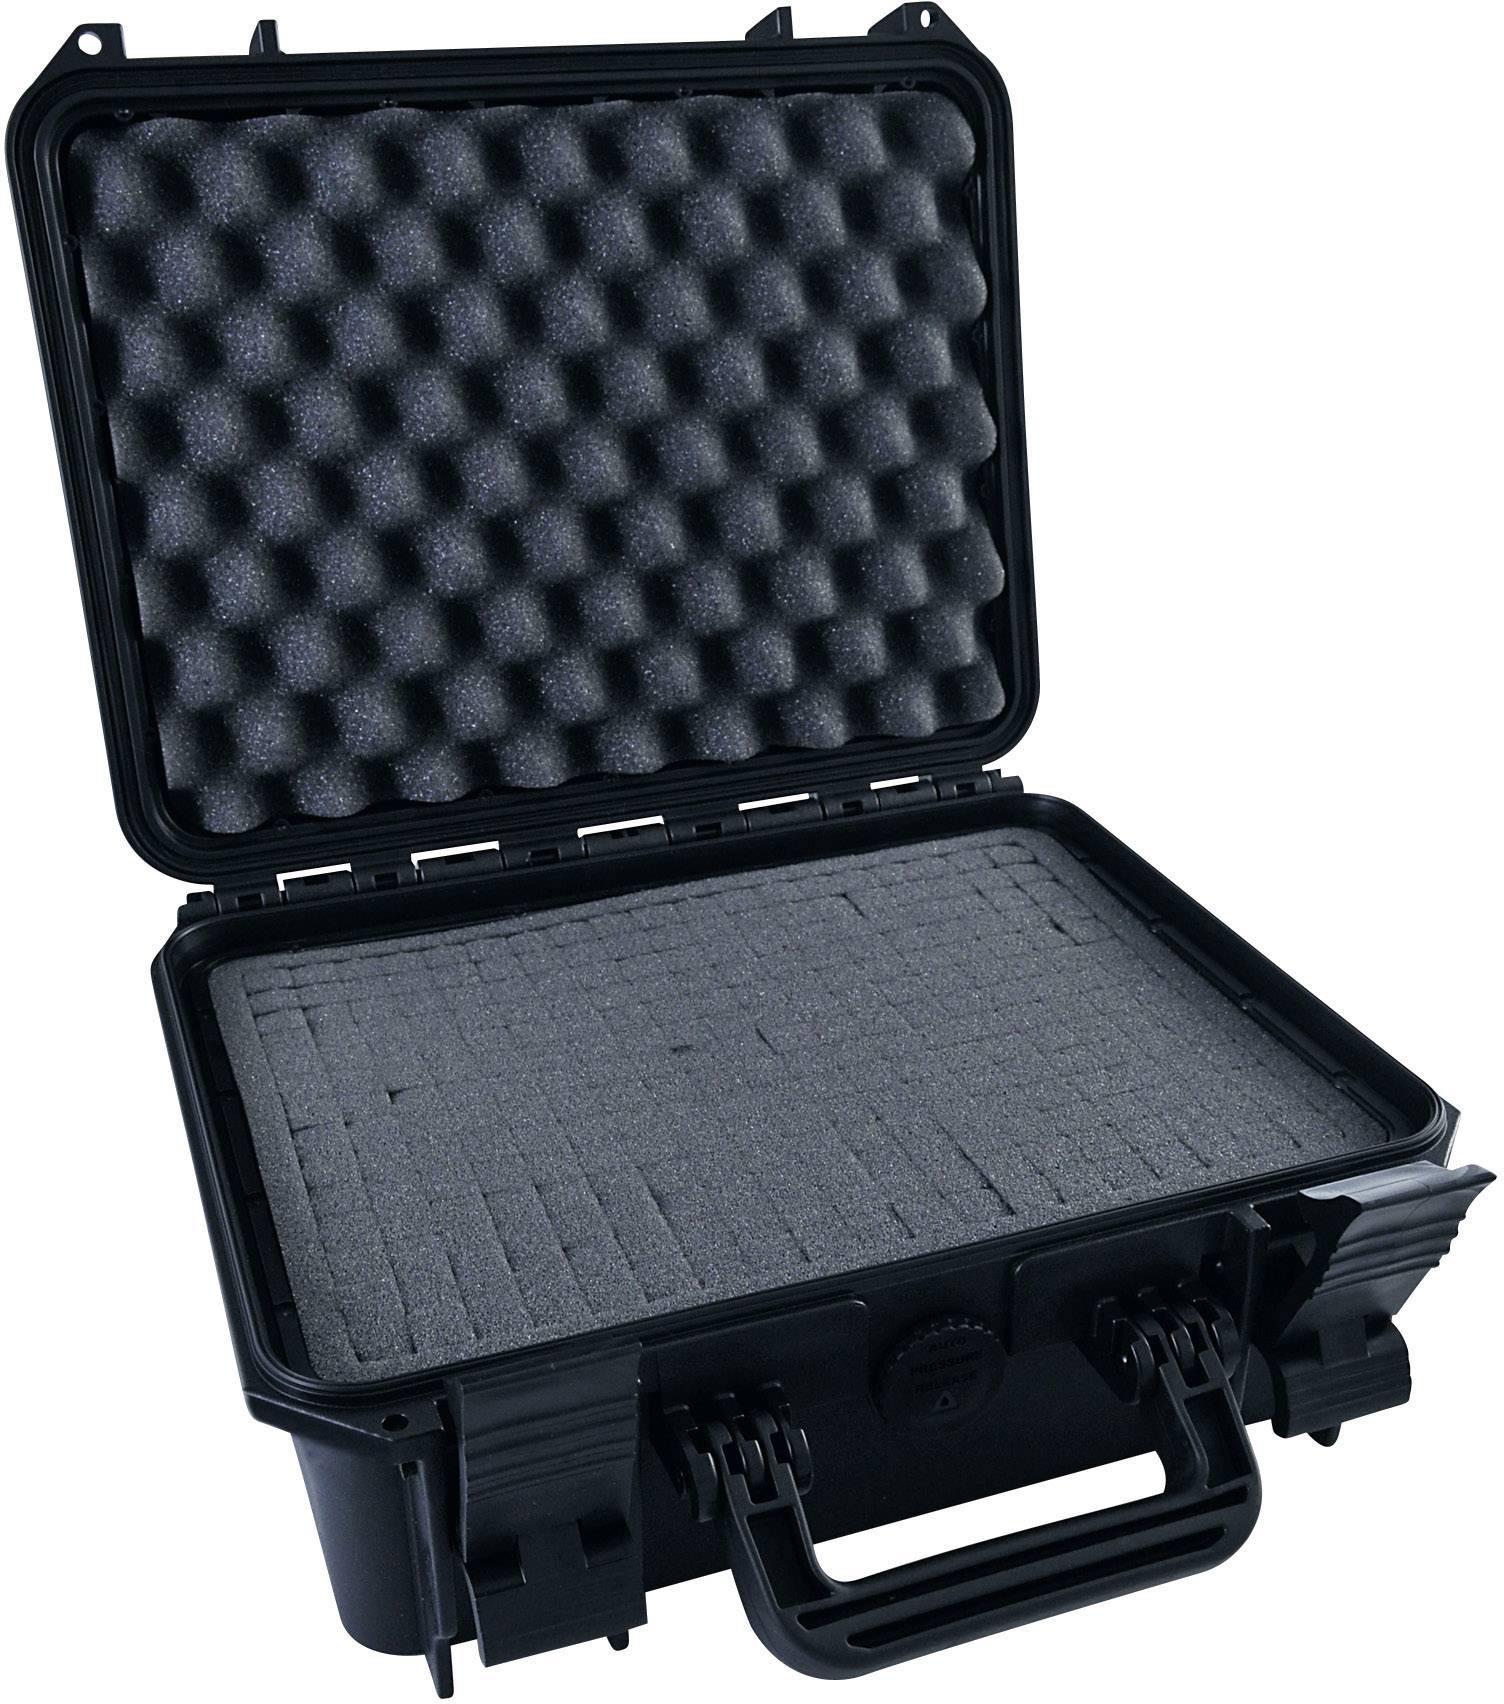 Kufor Xenotec MAX300S MAX300S 336 x 300 x 148 mm